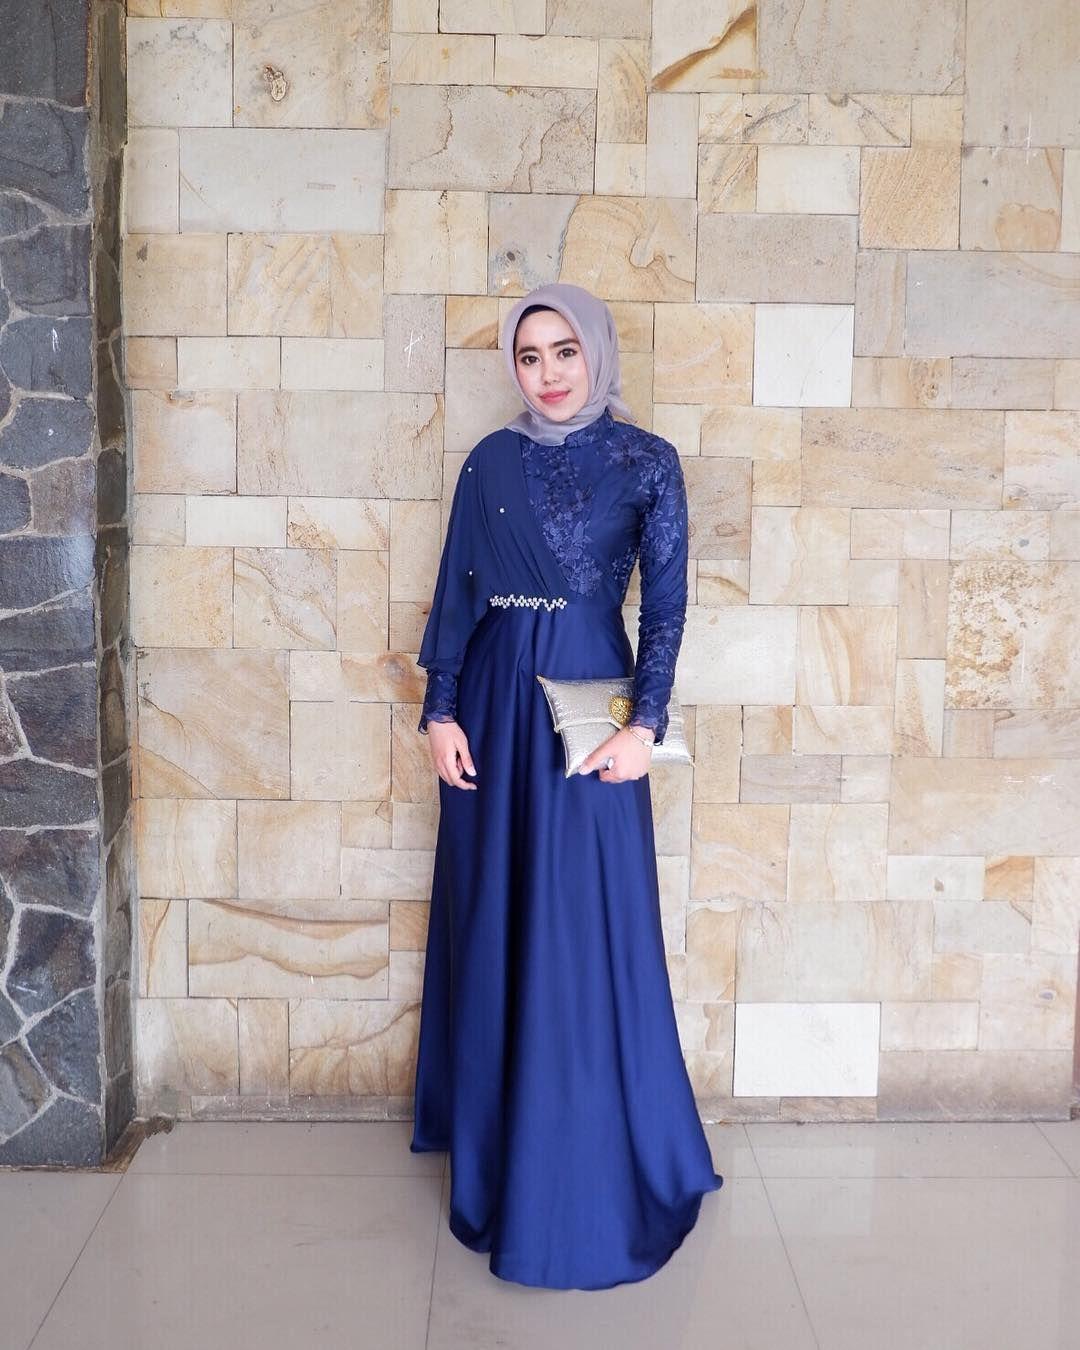 11+ Kebaya Hijab dengan Jahitan Unik di Pundak dan Dada. Psst